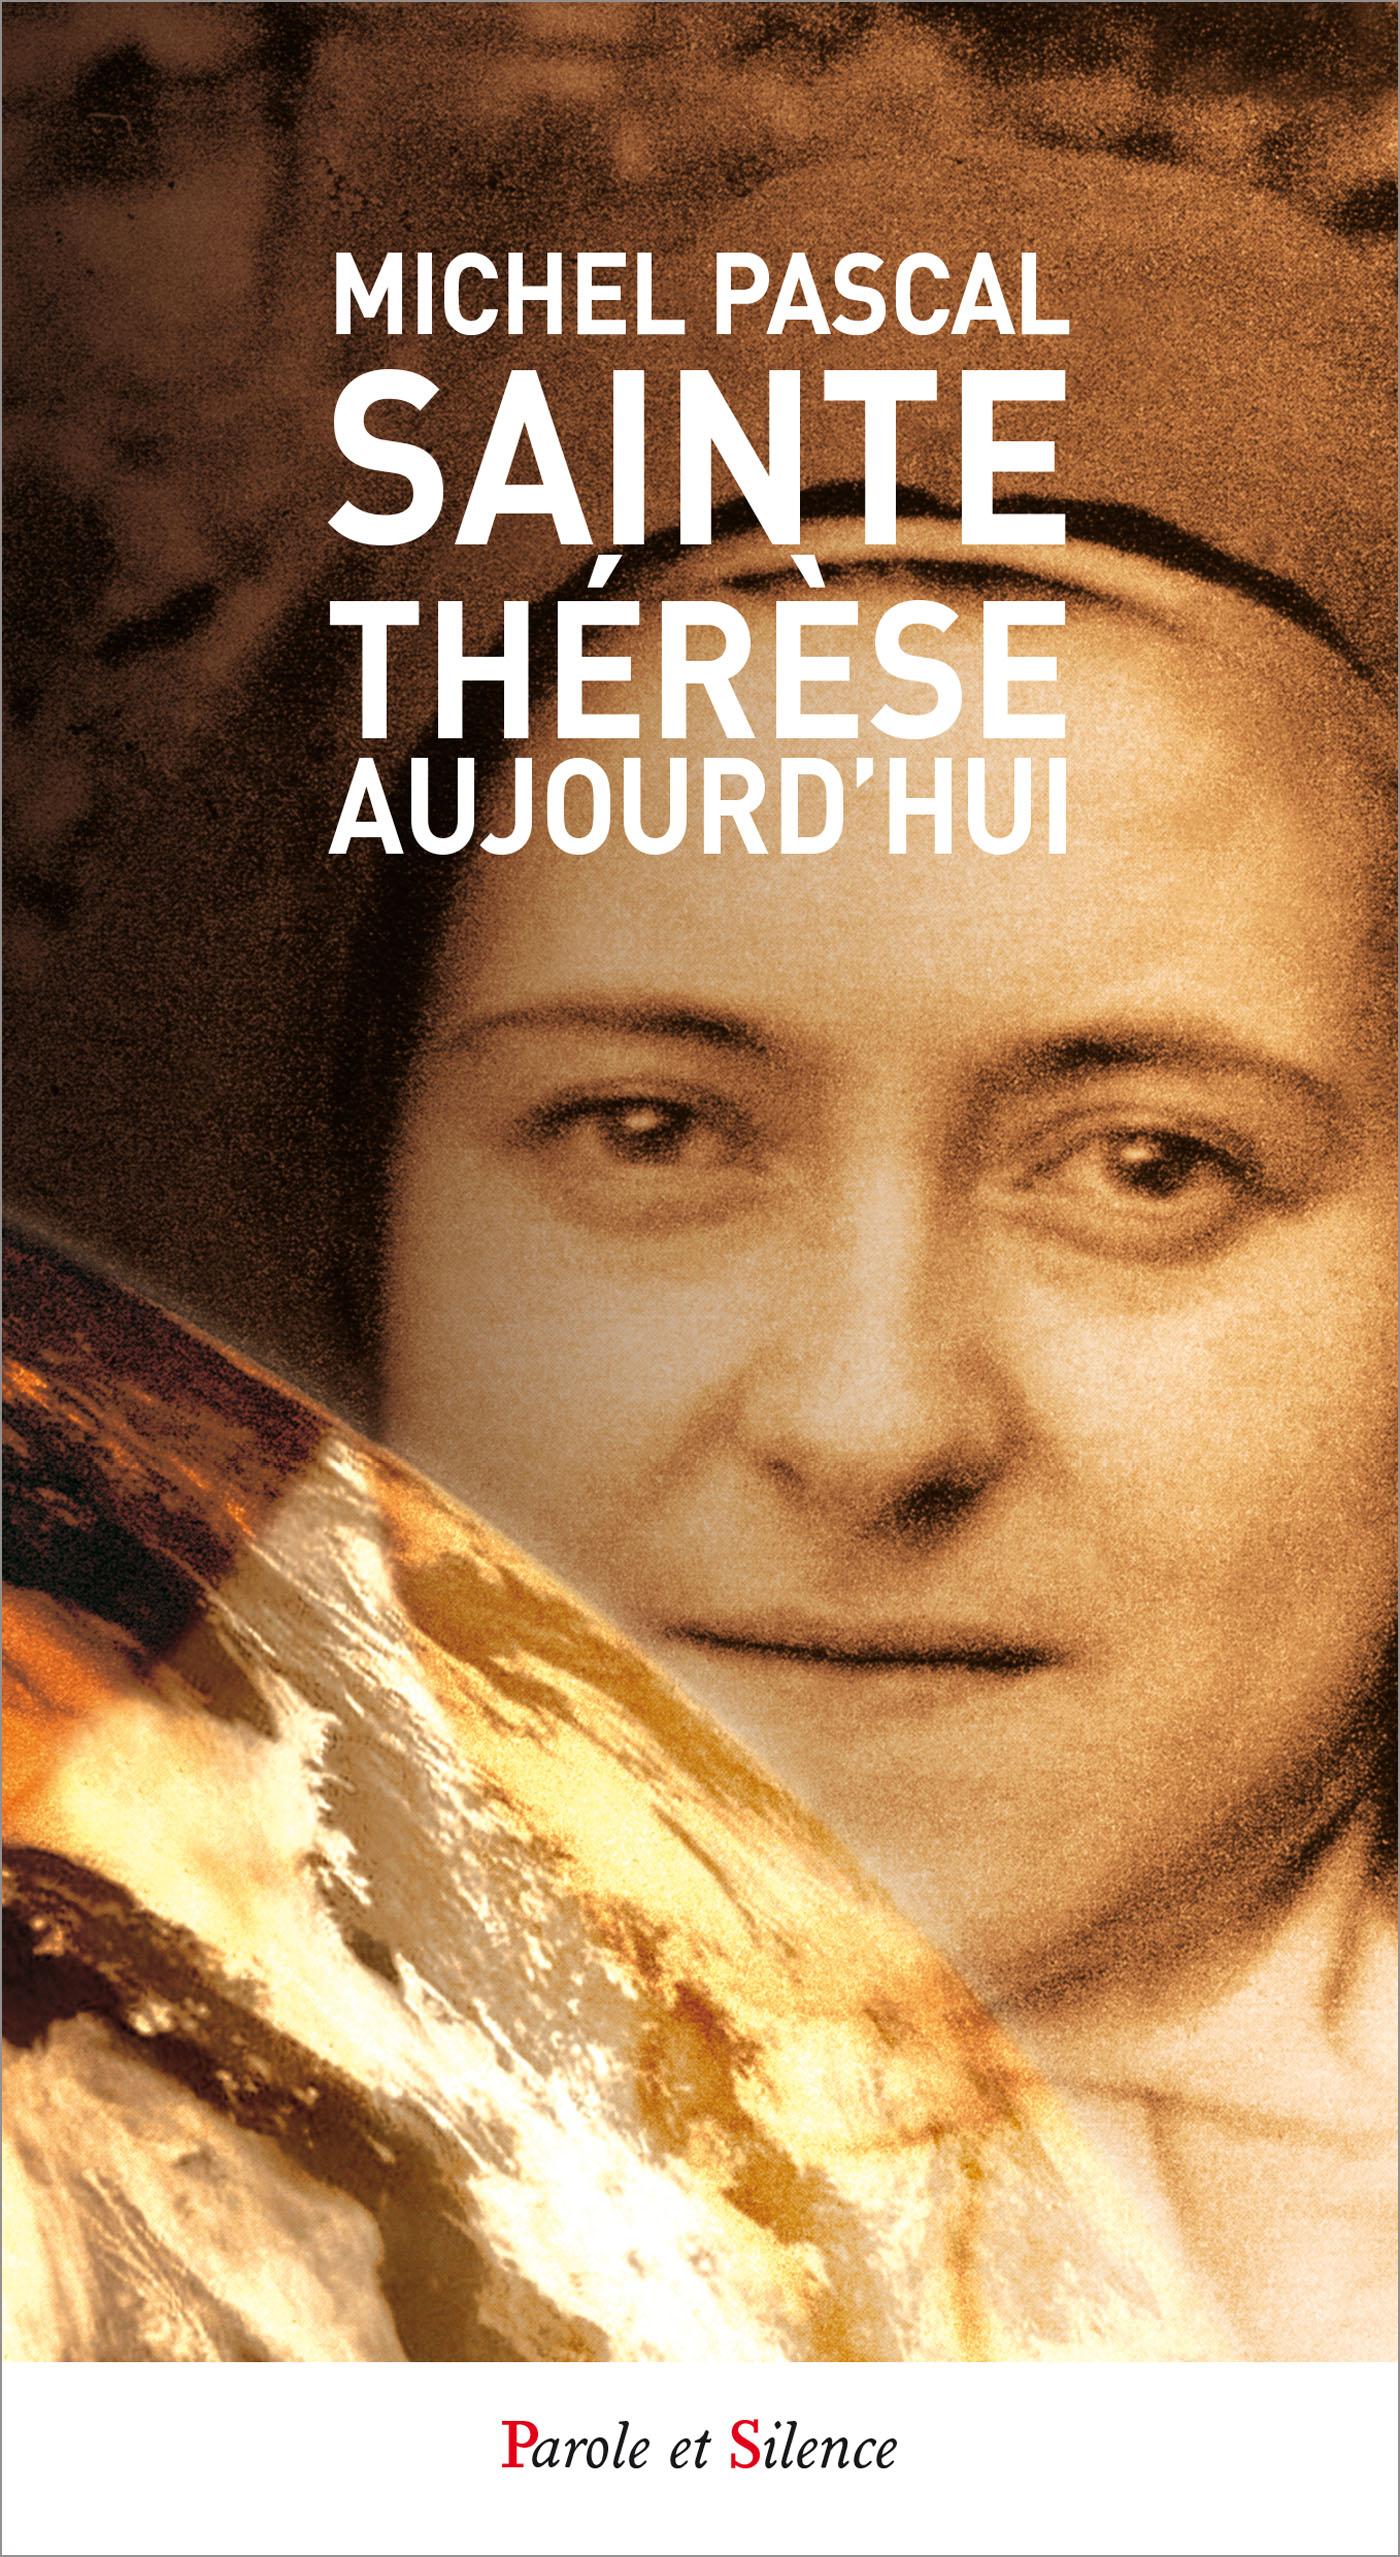 Sainte Thérèse aujourd'hui